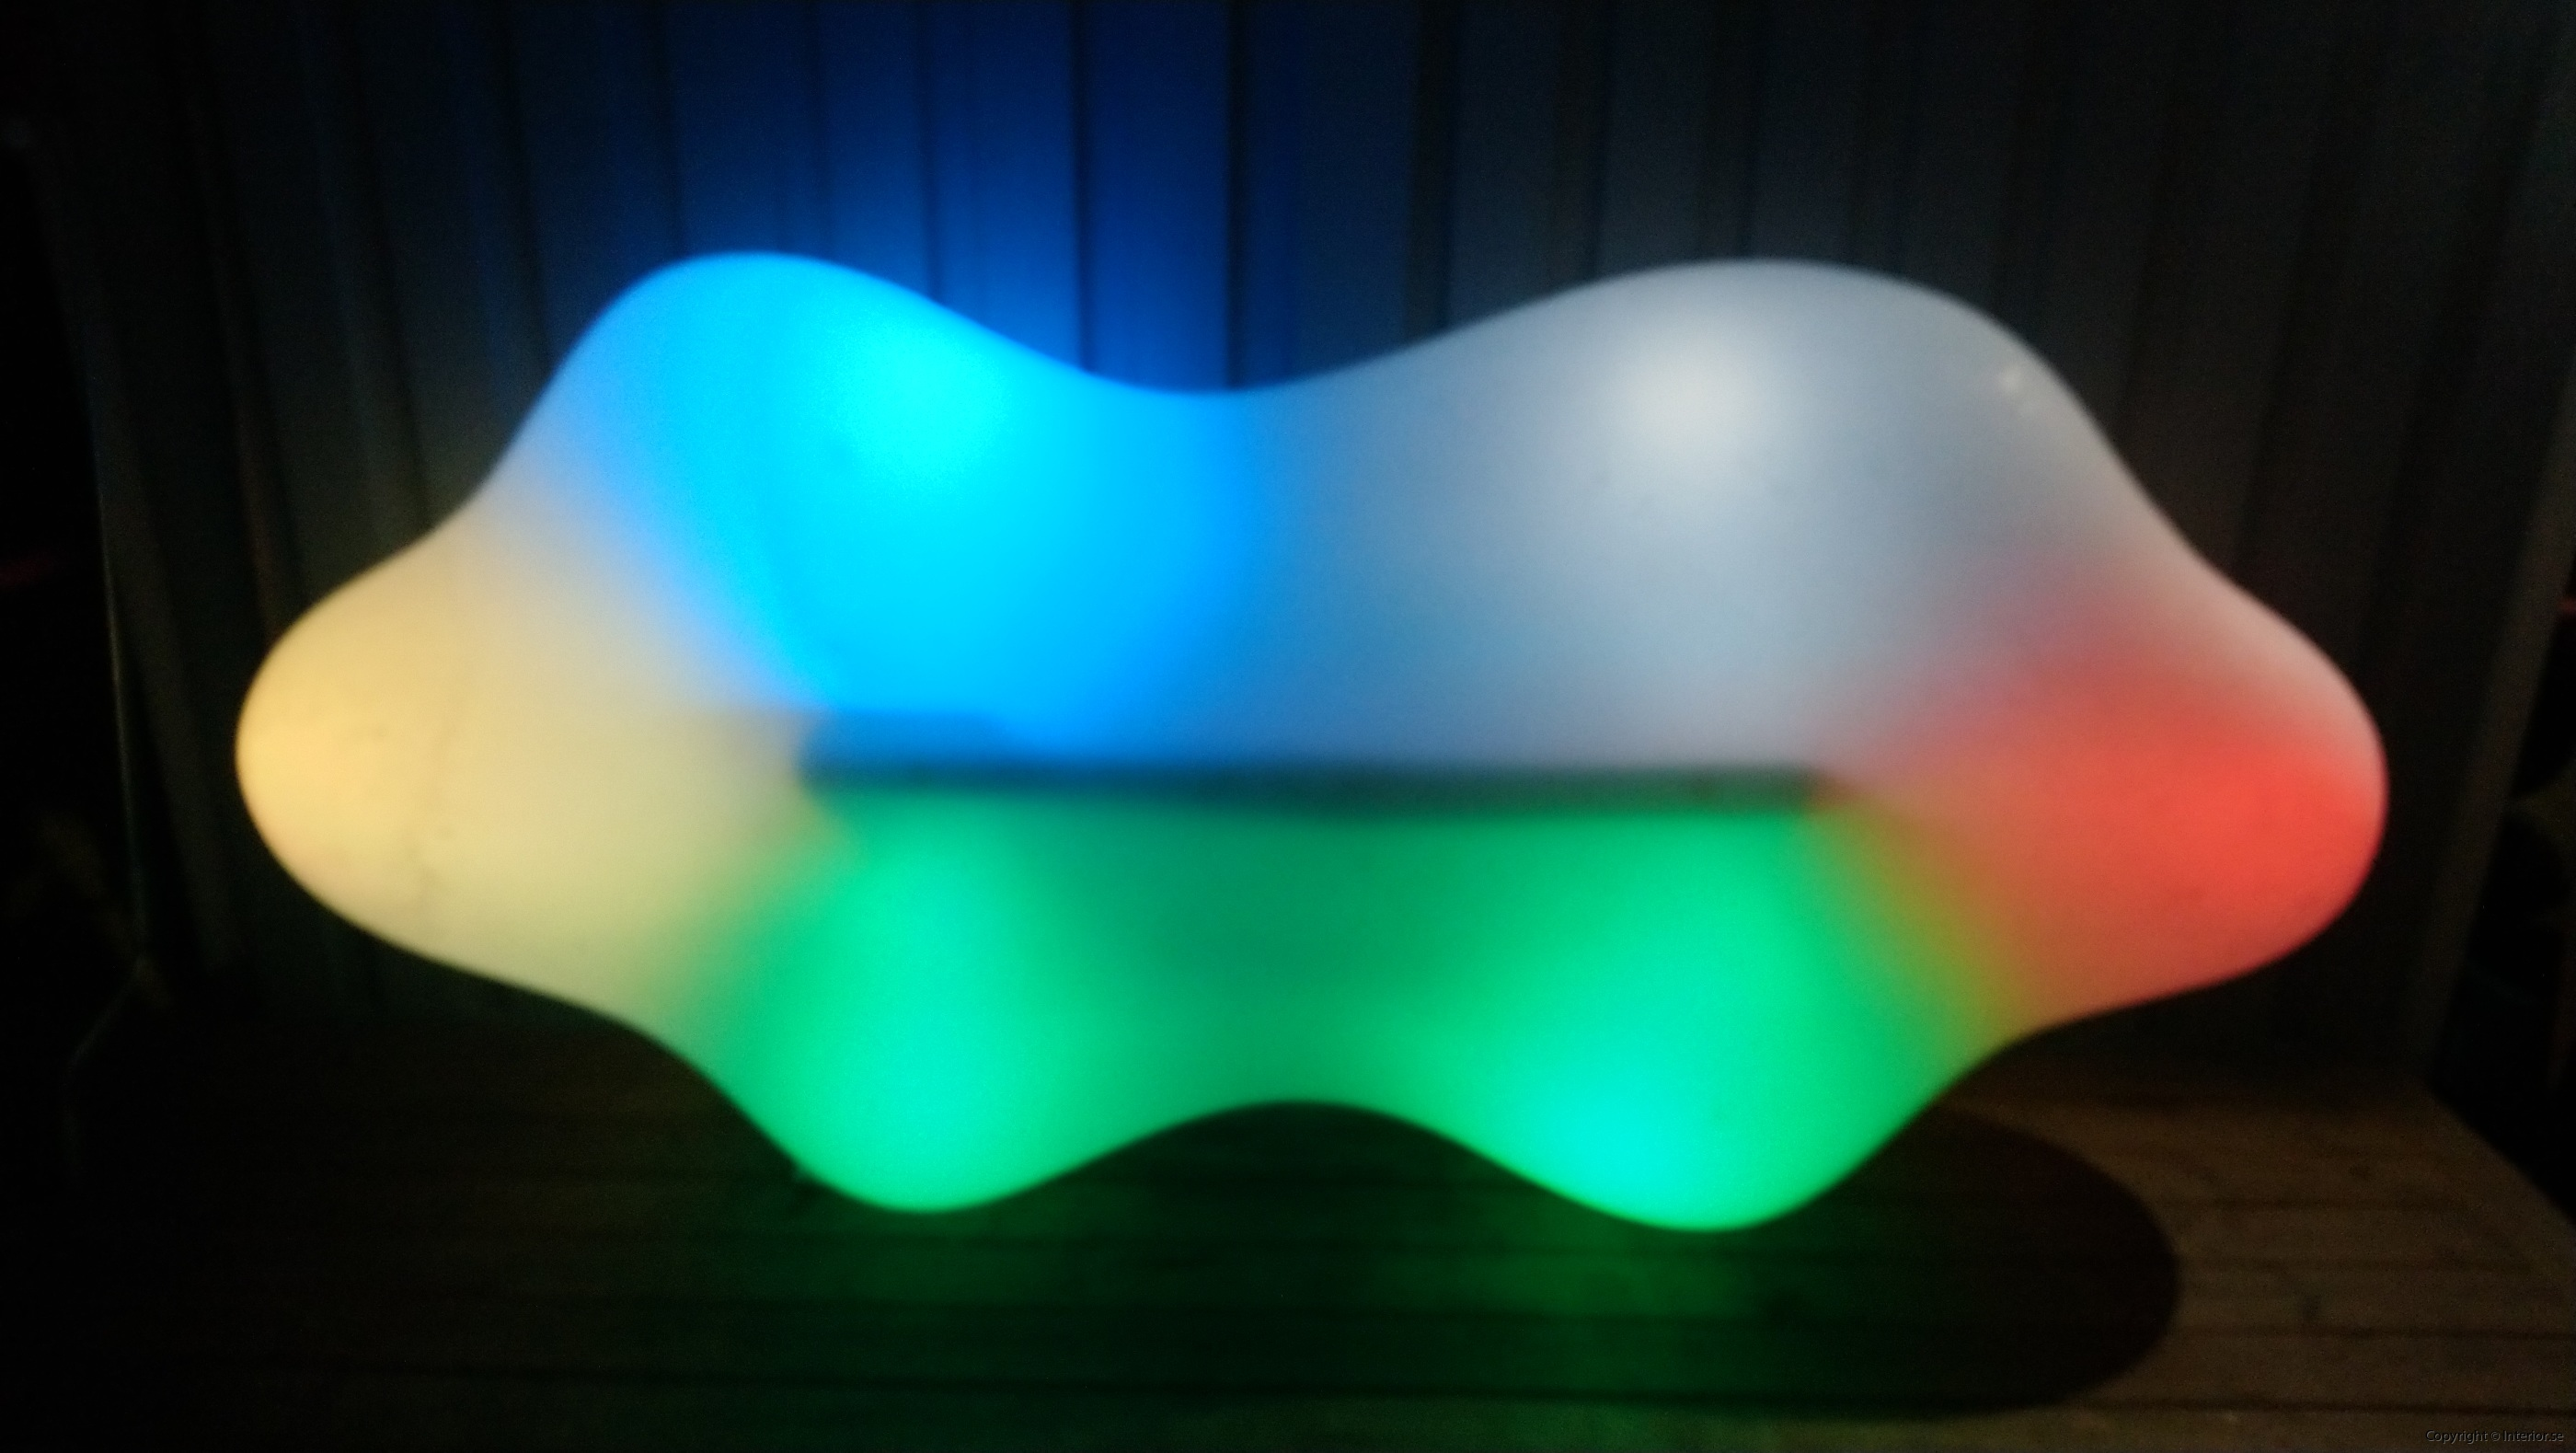 Hyr Vondom Lava Bench RGB LED möbler - Karim Rashid hyra ledmöbler hyr möbler event stockholm billigt design led (4)